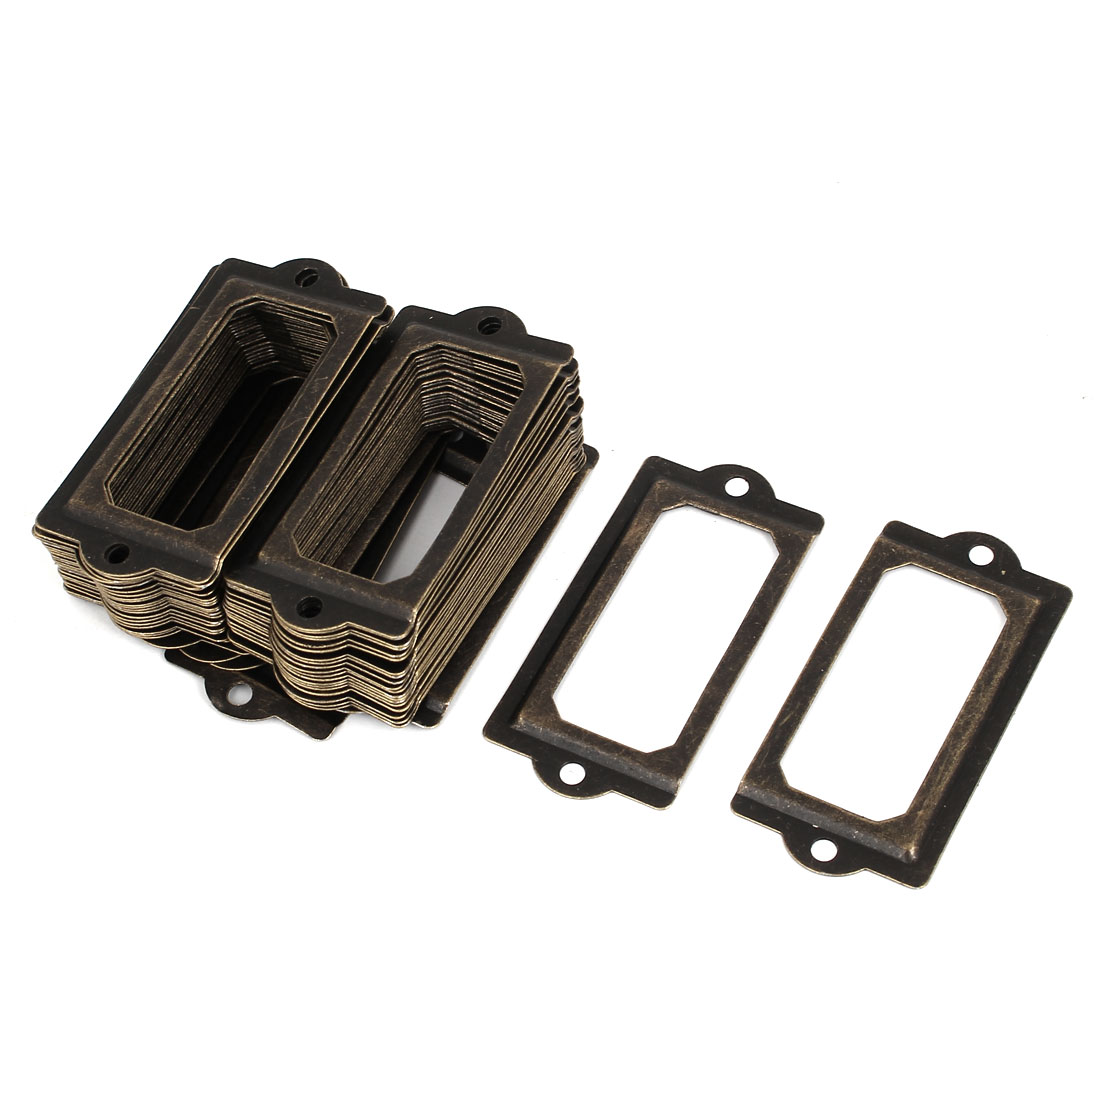 70mmx33mm Office Drawer Cabinet Label Pull Holder Frame Bronze Tone 50pcs